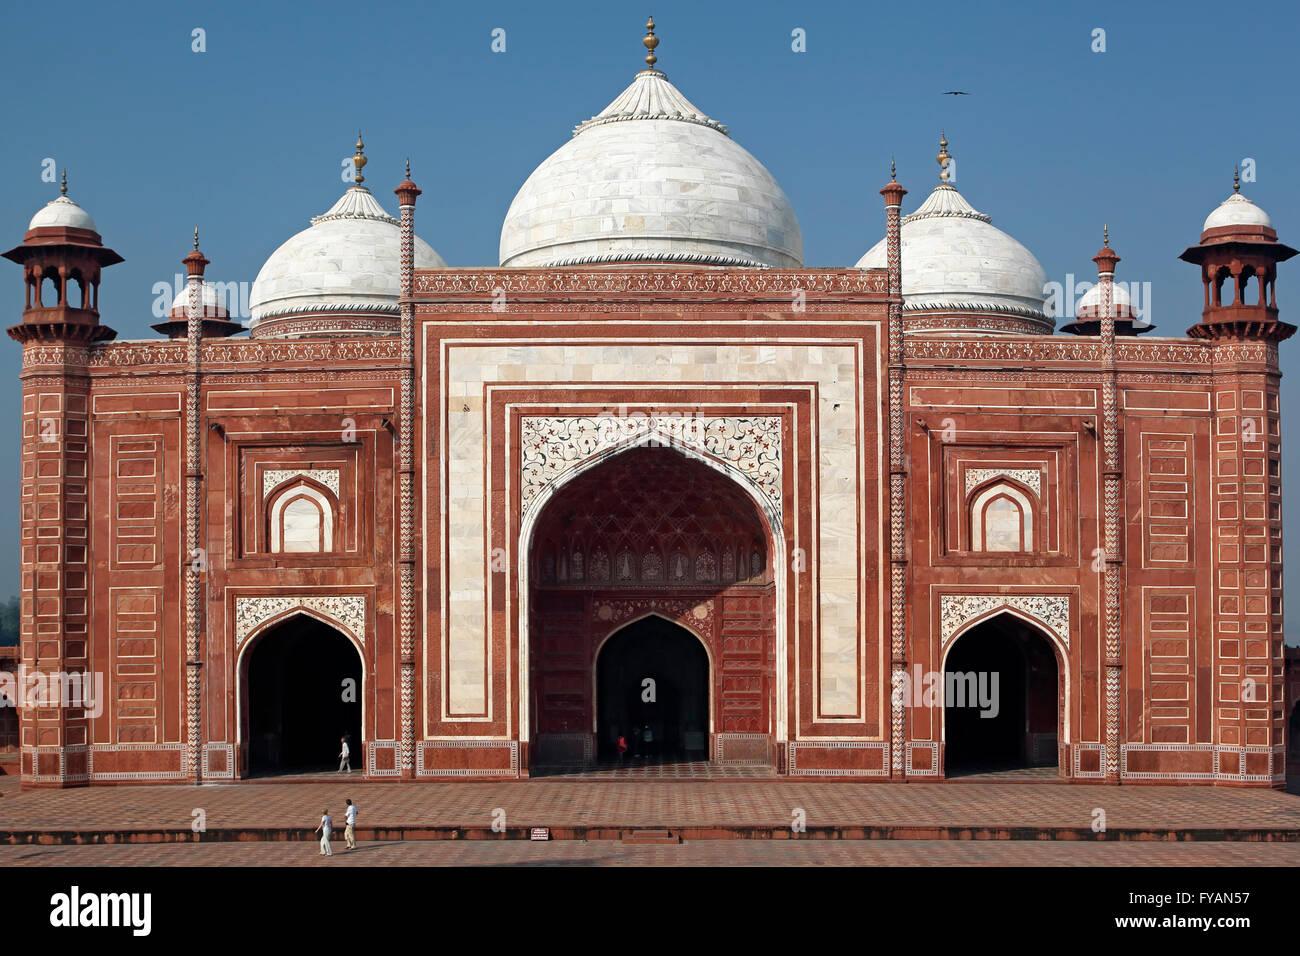 Taj Mahal mosque (masjid), Agra, Uttar Pradesh, India - Stock Image